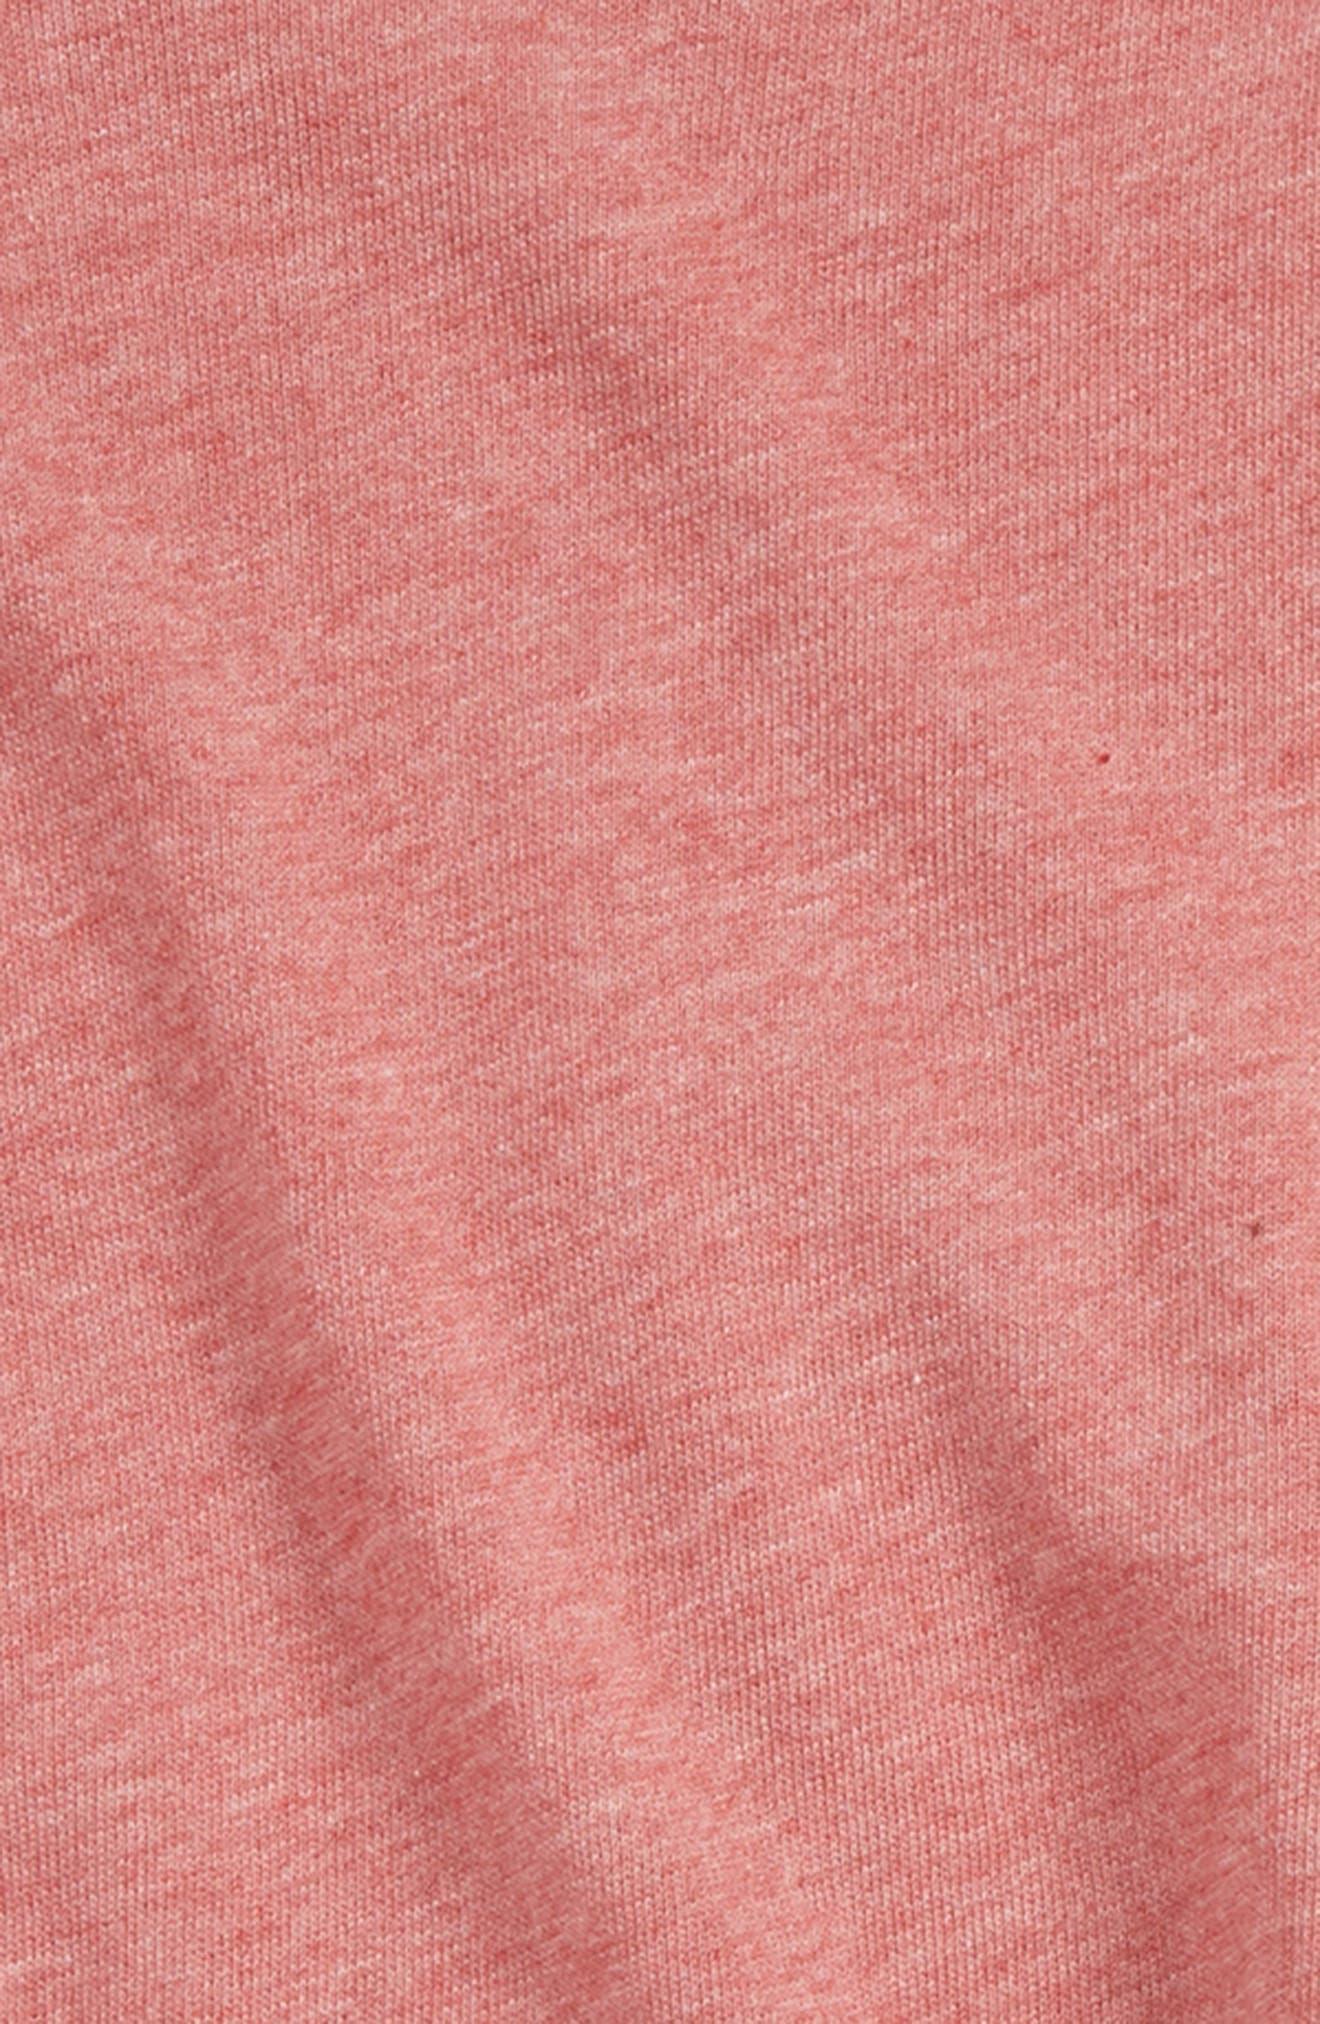 Ruffle Sweatshirt & Leggings Set,                             Alternate thumbnail 2, color,                             WINTER ROSE